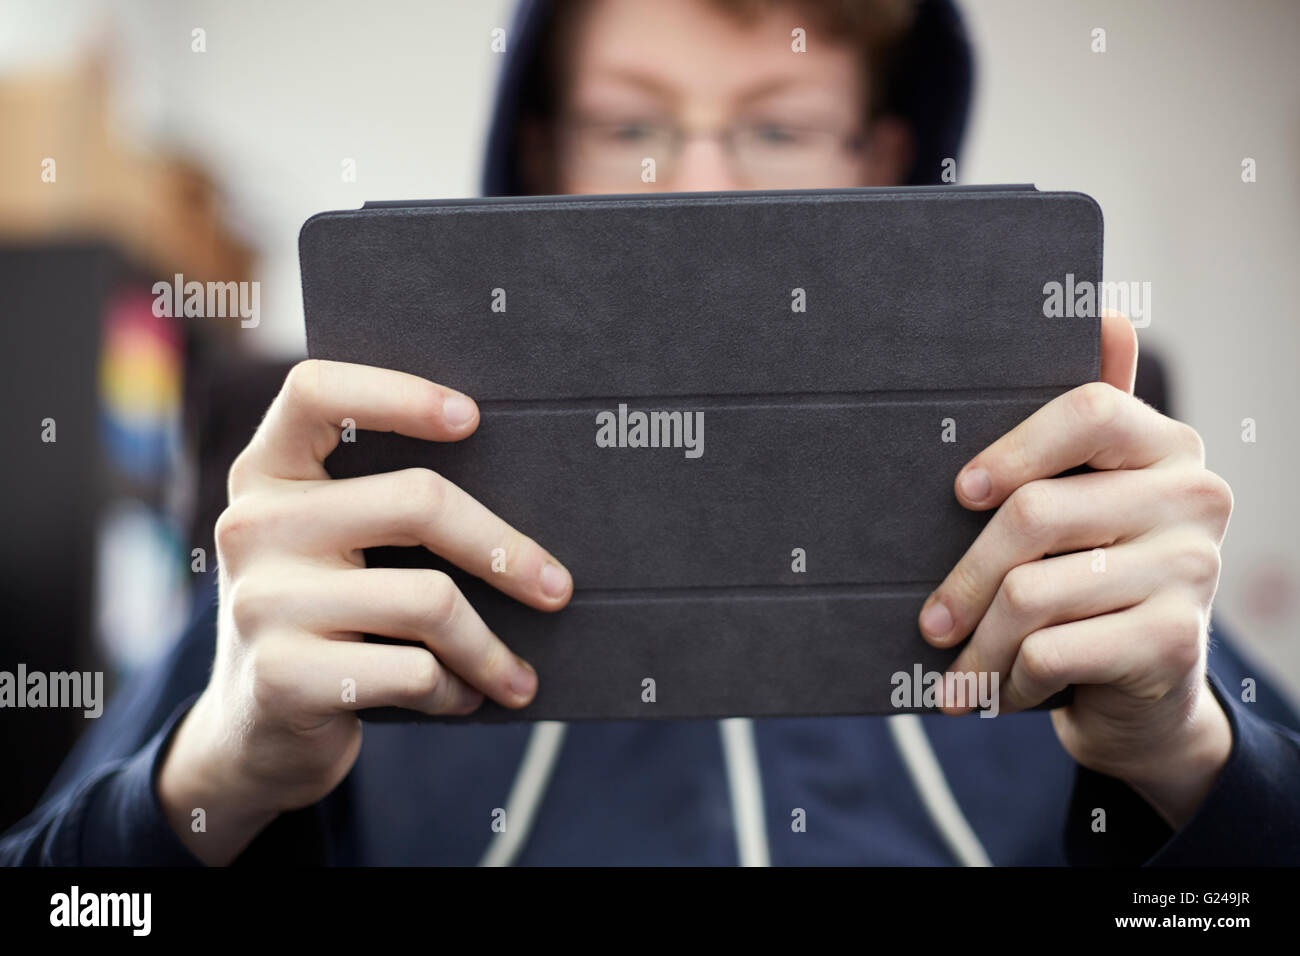 Man with Glasses using Apple iPad - Stock Image